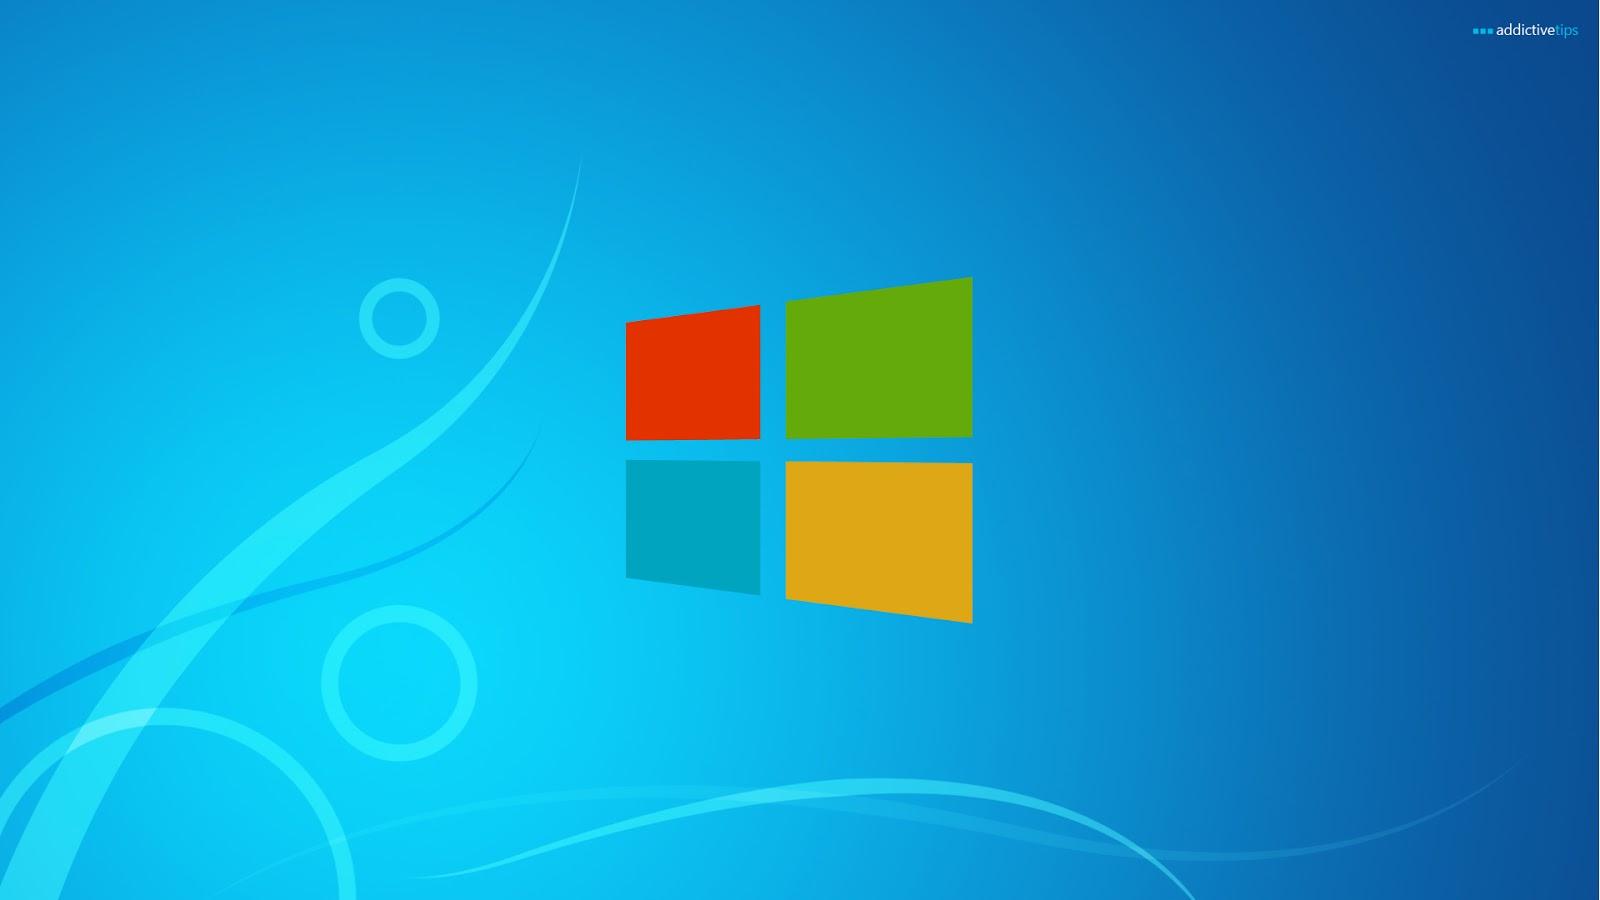 Hd Windows 8 Wallpapers  Nice Wallpapers-7483